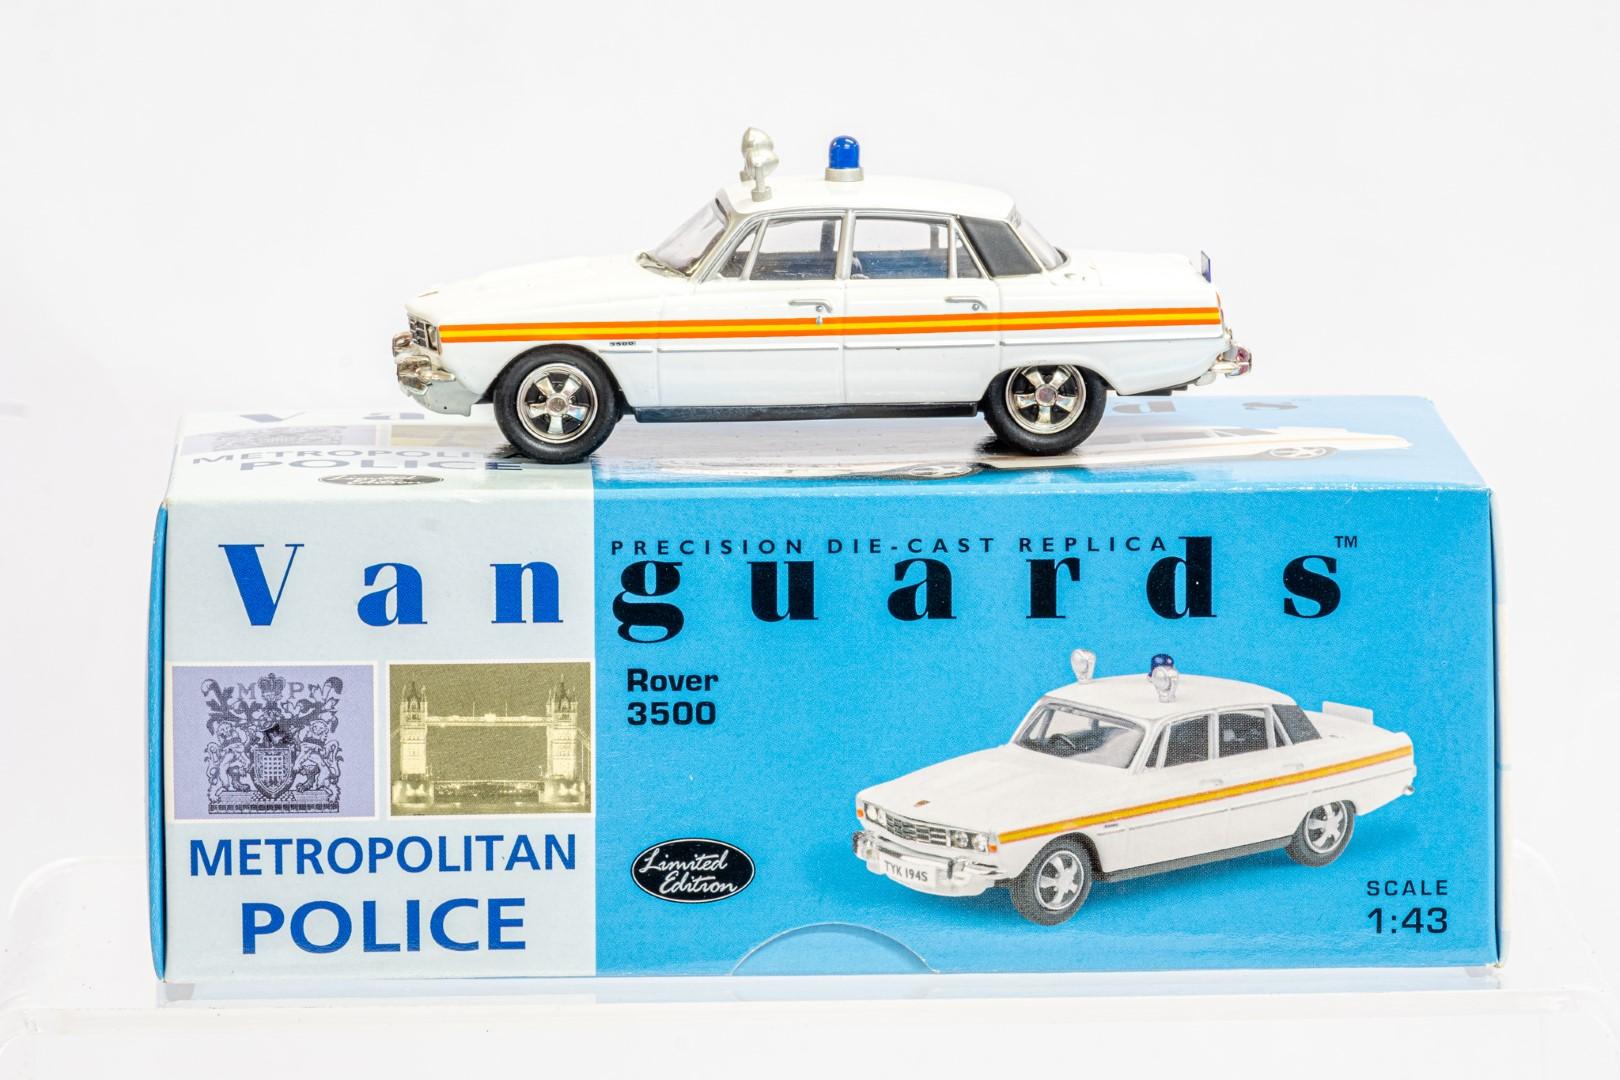 Vanguards Rover 3500 - Traffic Car - Image 2 of 8